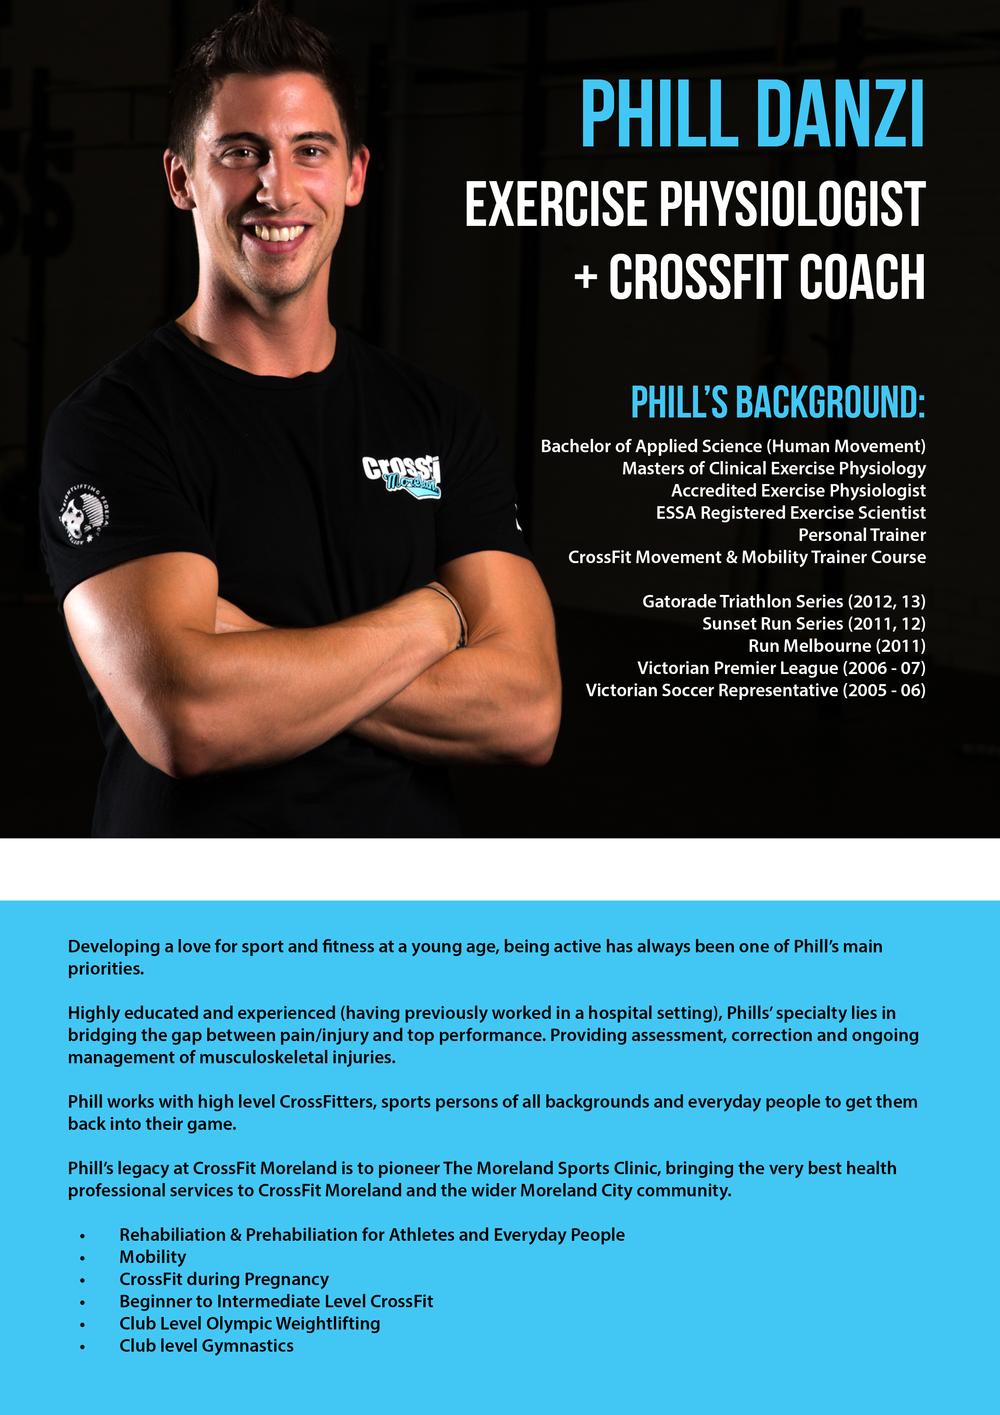 CrossFit Moreland - Phill Danzi